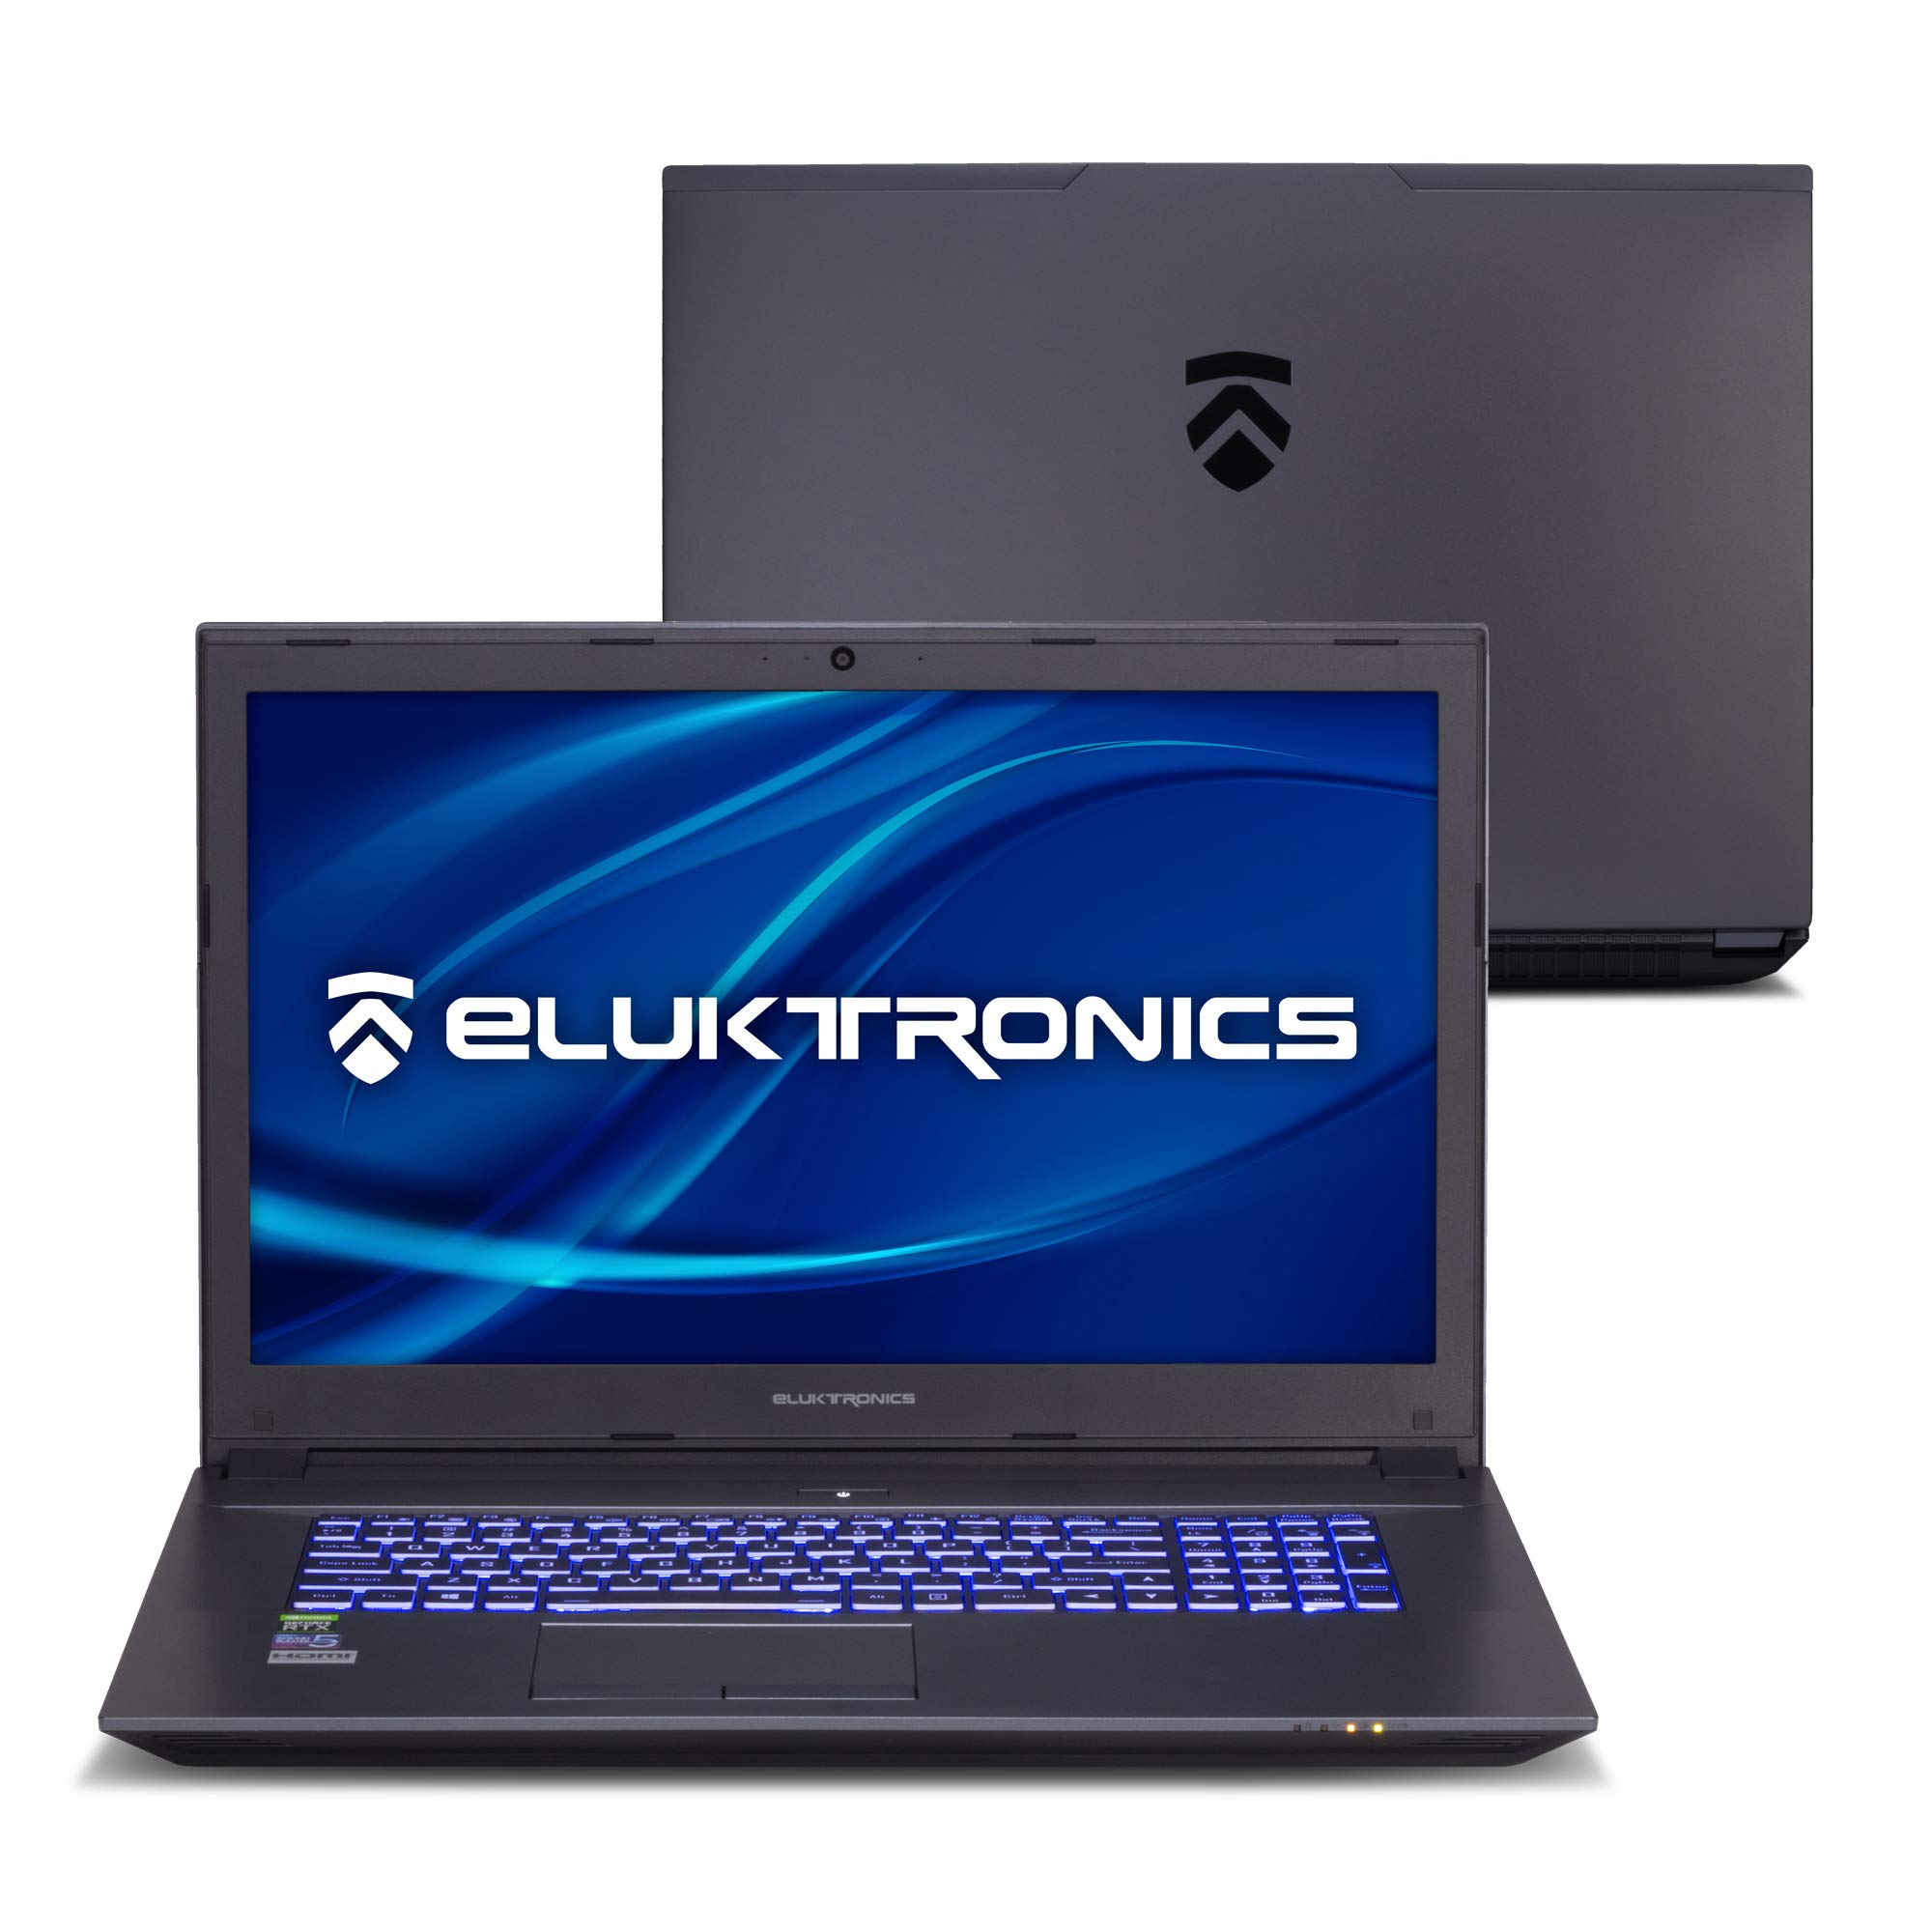 Eluktronics N970TF Desktop Powered Gaming